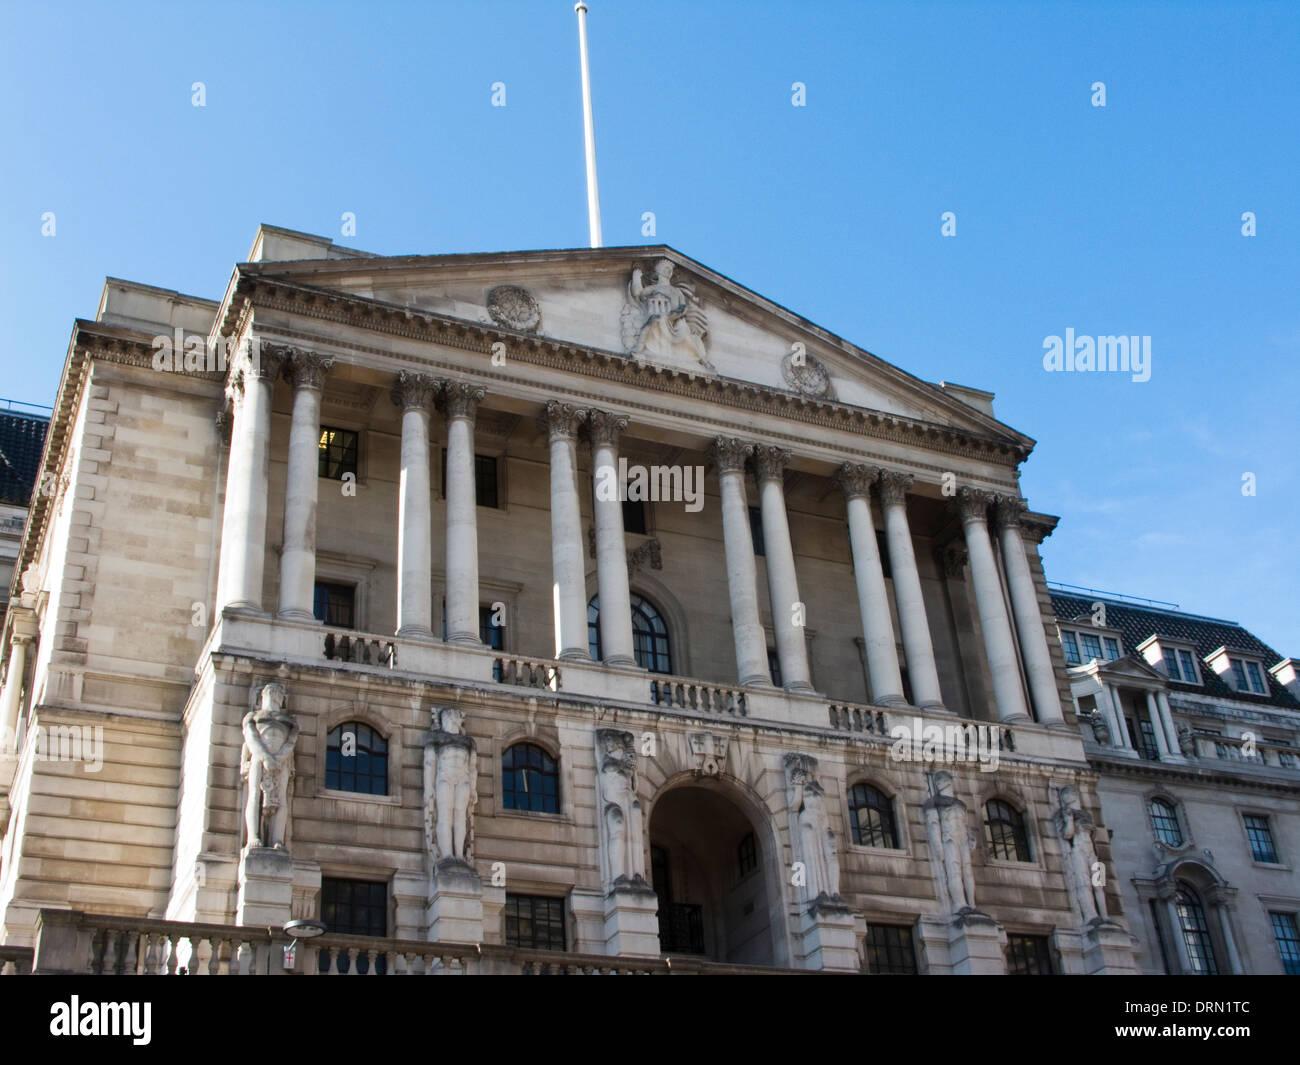 Facade of The Bank of England, Threadneedle Street, London - Stock Image